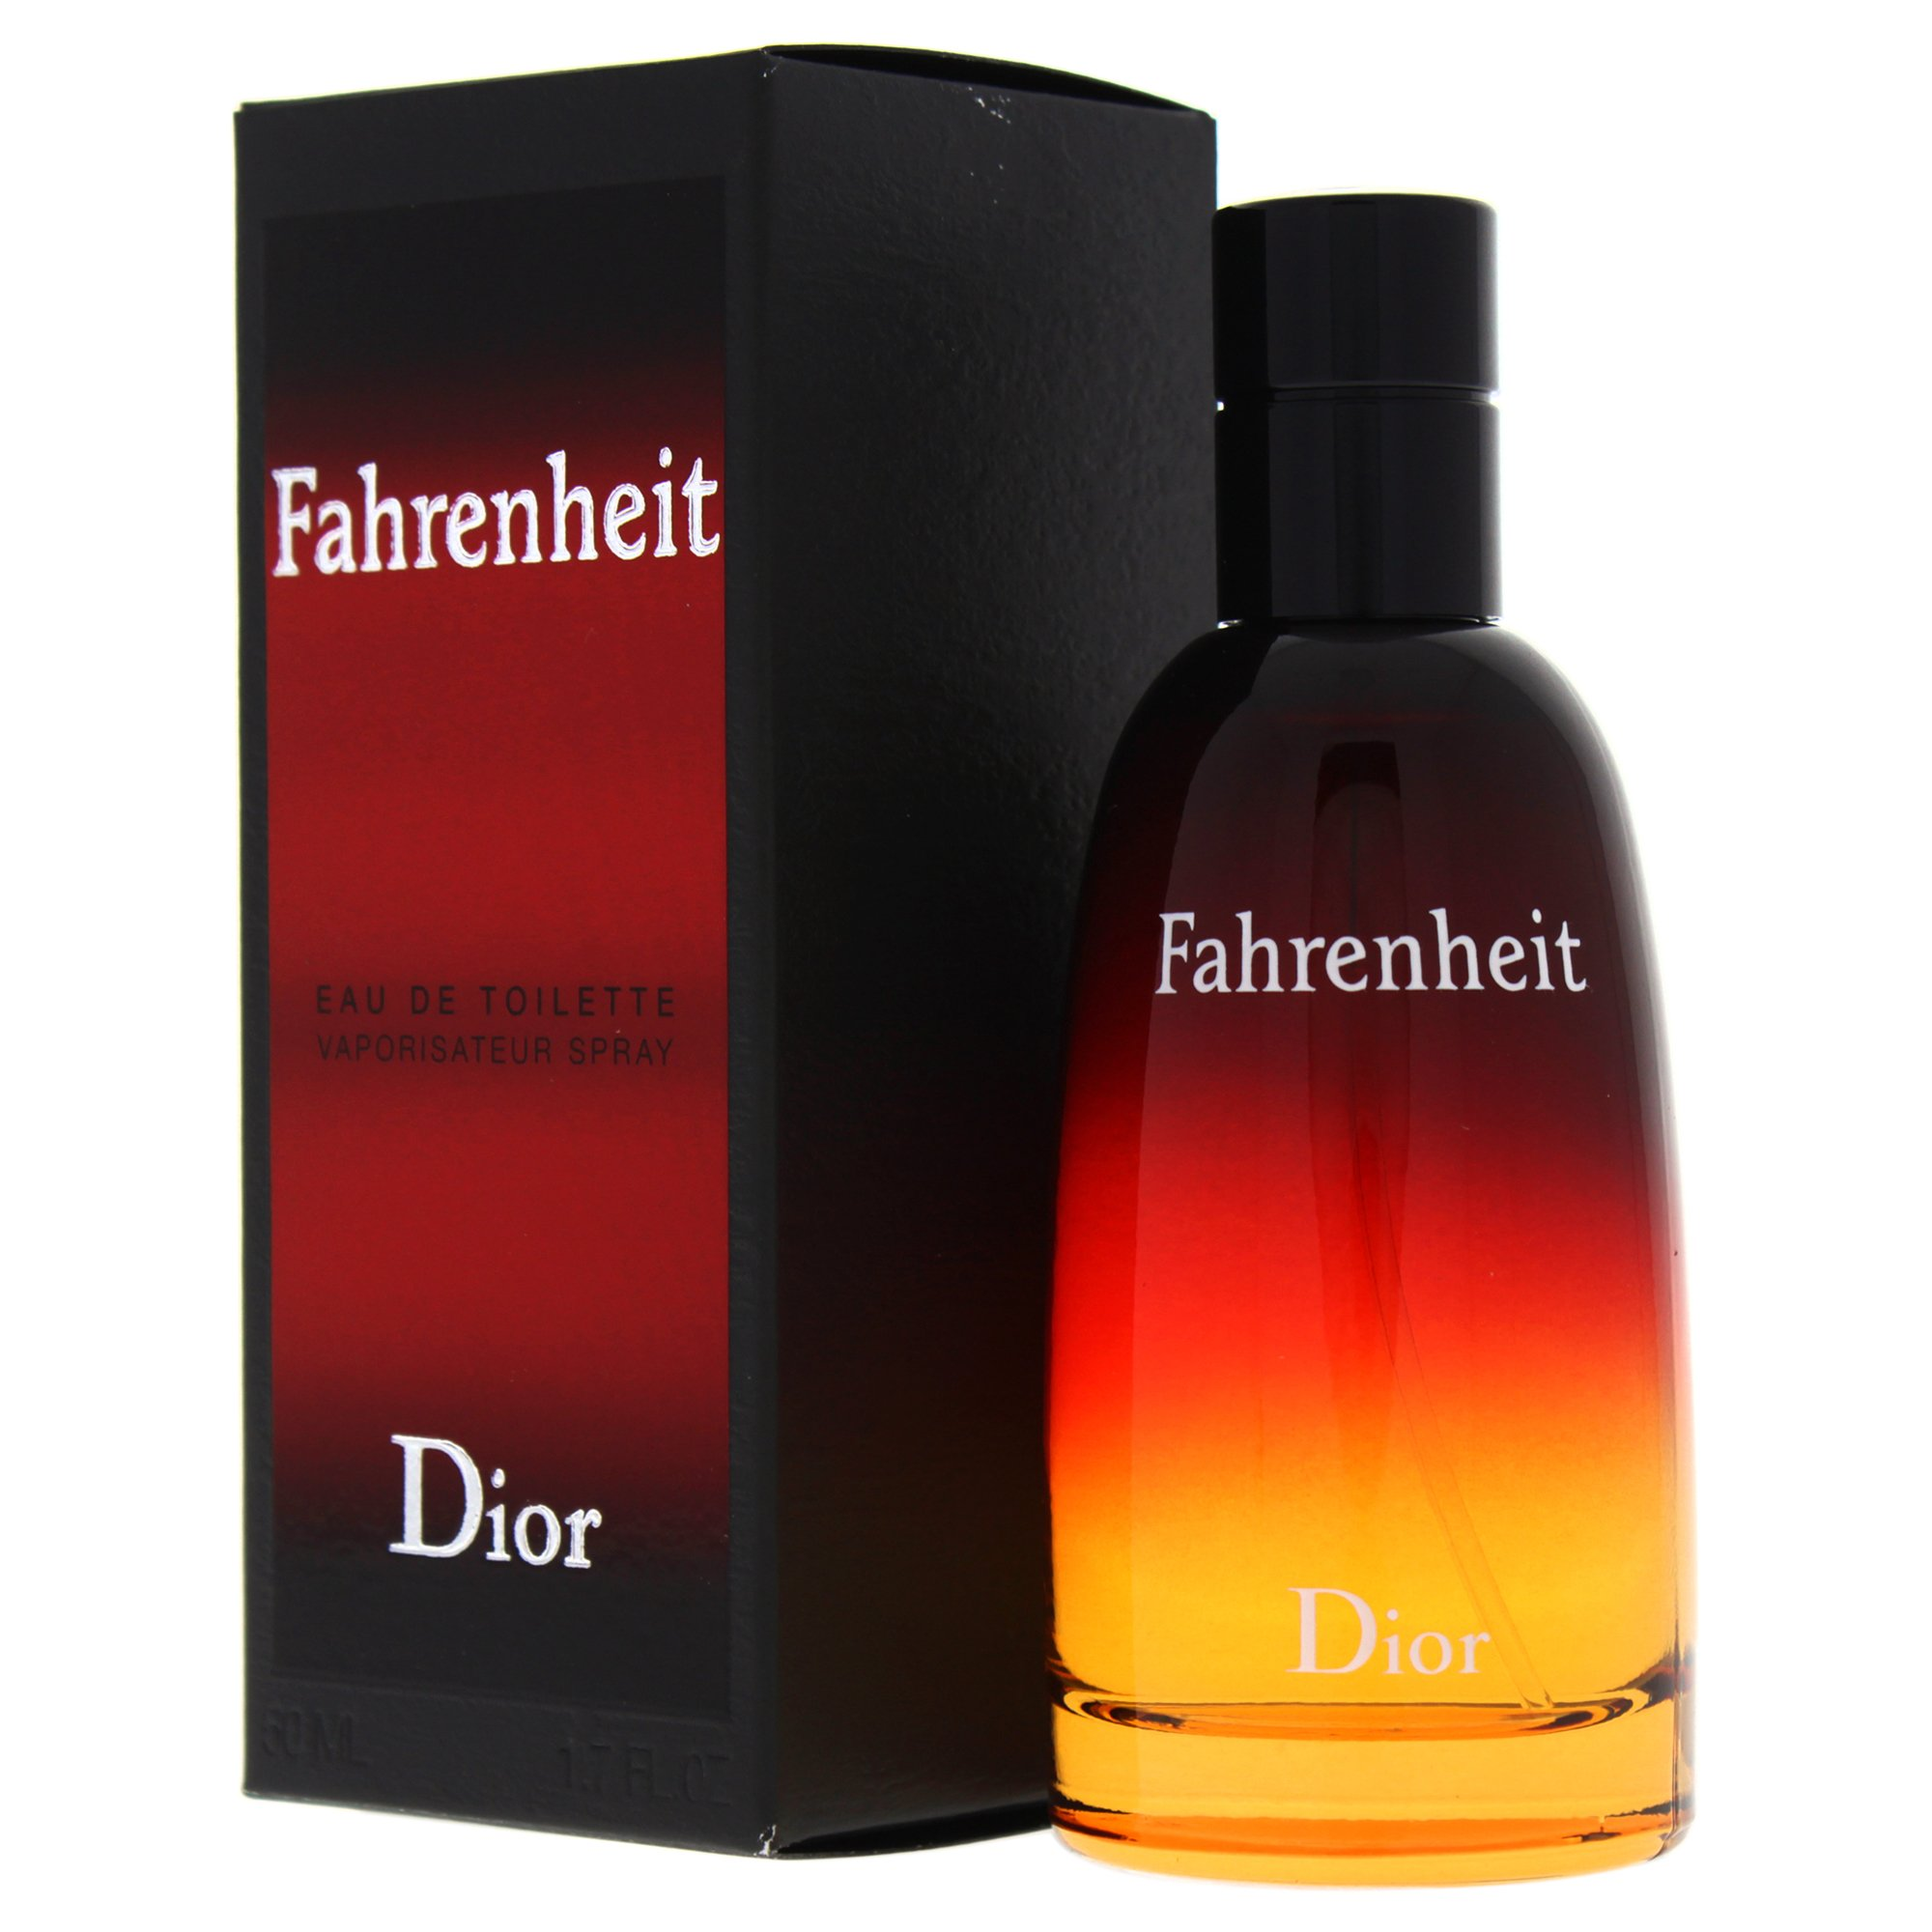 Fahrenheit By Christian Dior For Men. Eau De Toilette Spray 1.7 Ounces by Dior (Image #5)